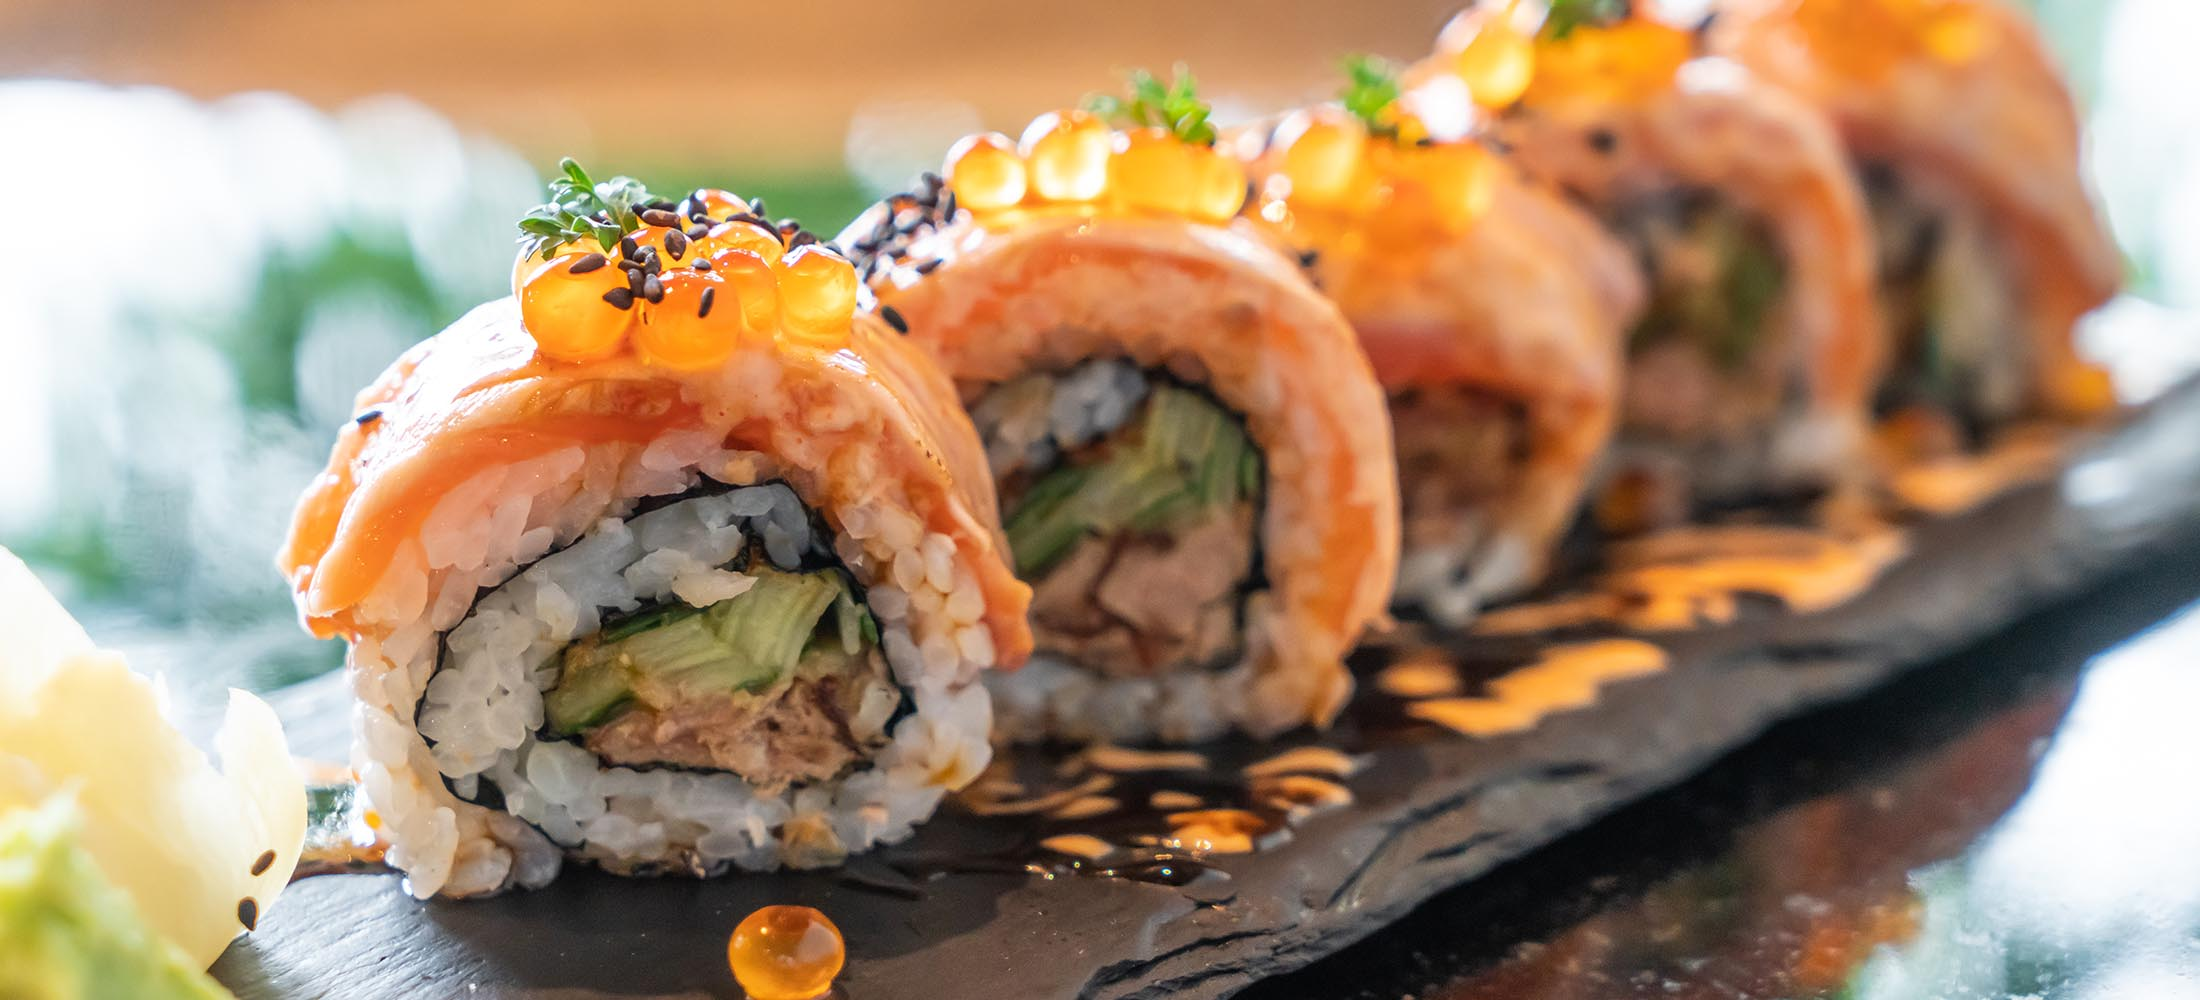 Tama sushi ristorante giapponese Vertemate